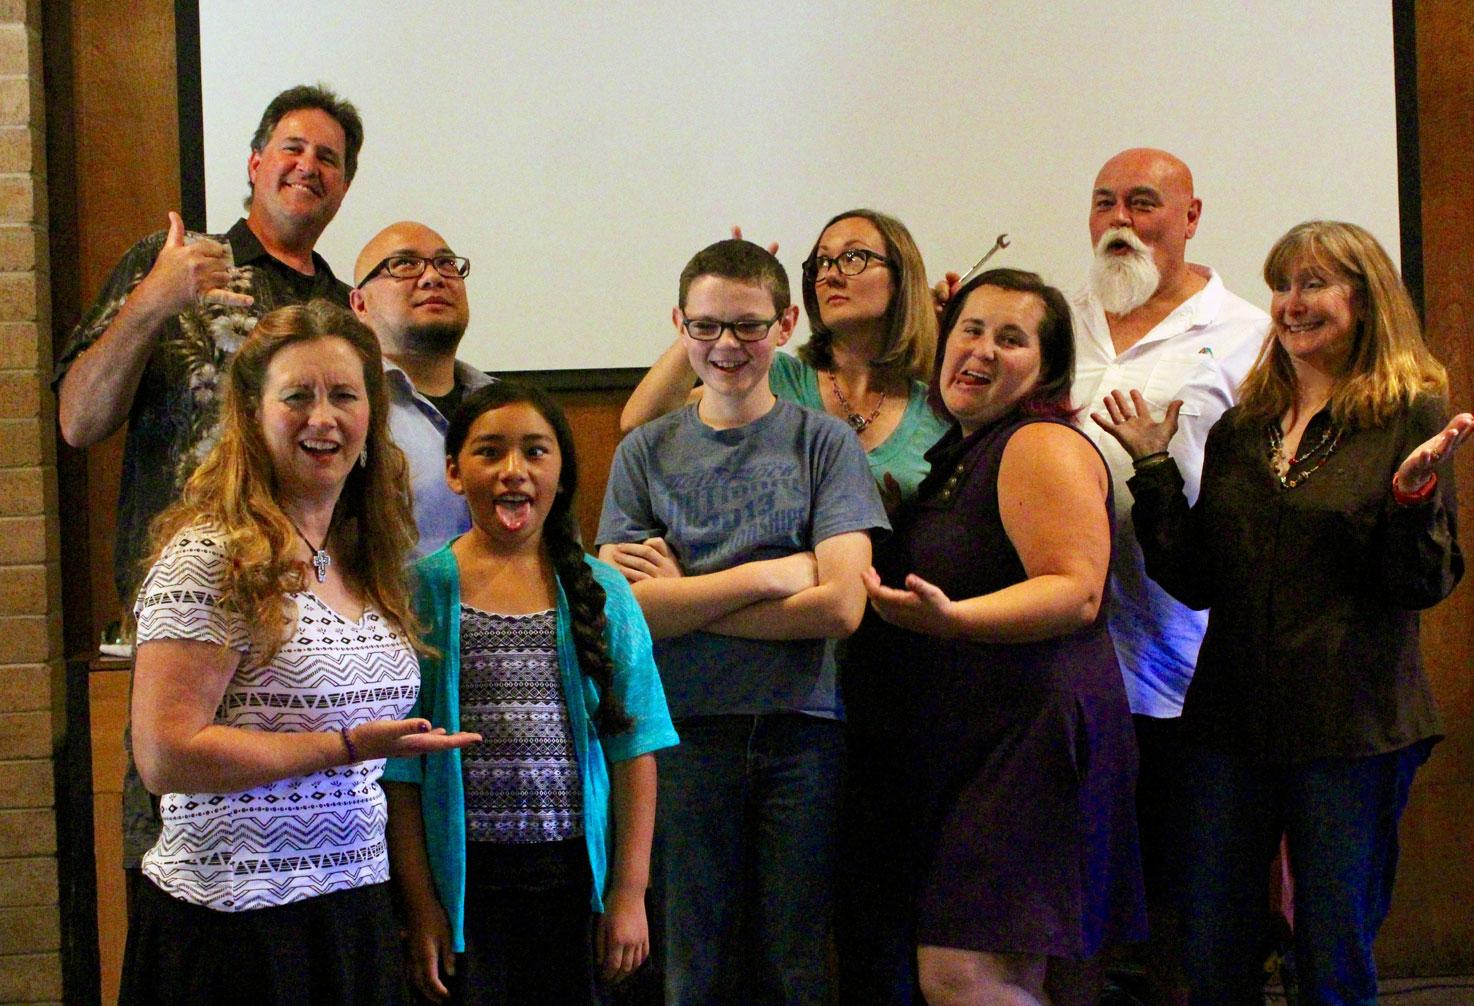 Napa Methodist Church Fusion Worship team at play